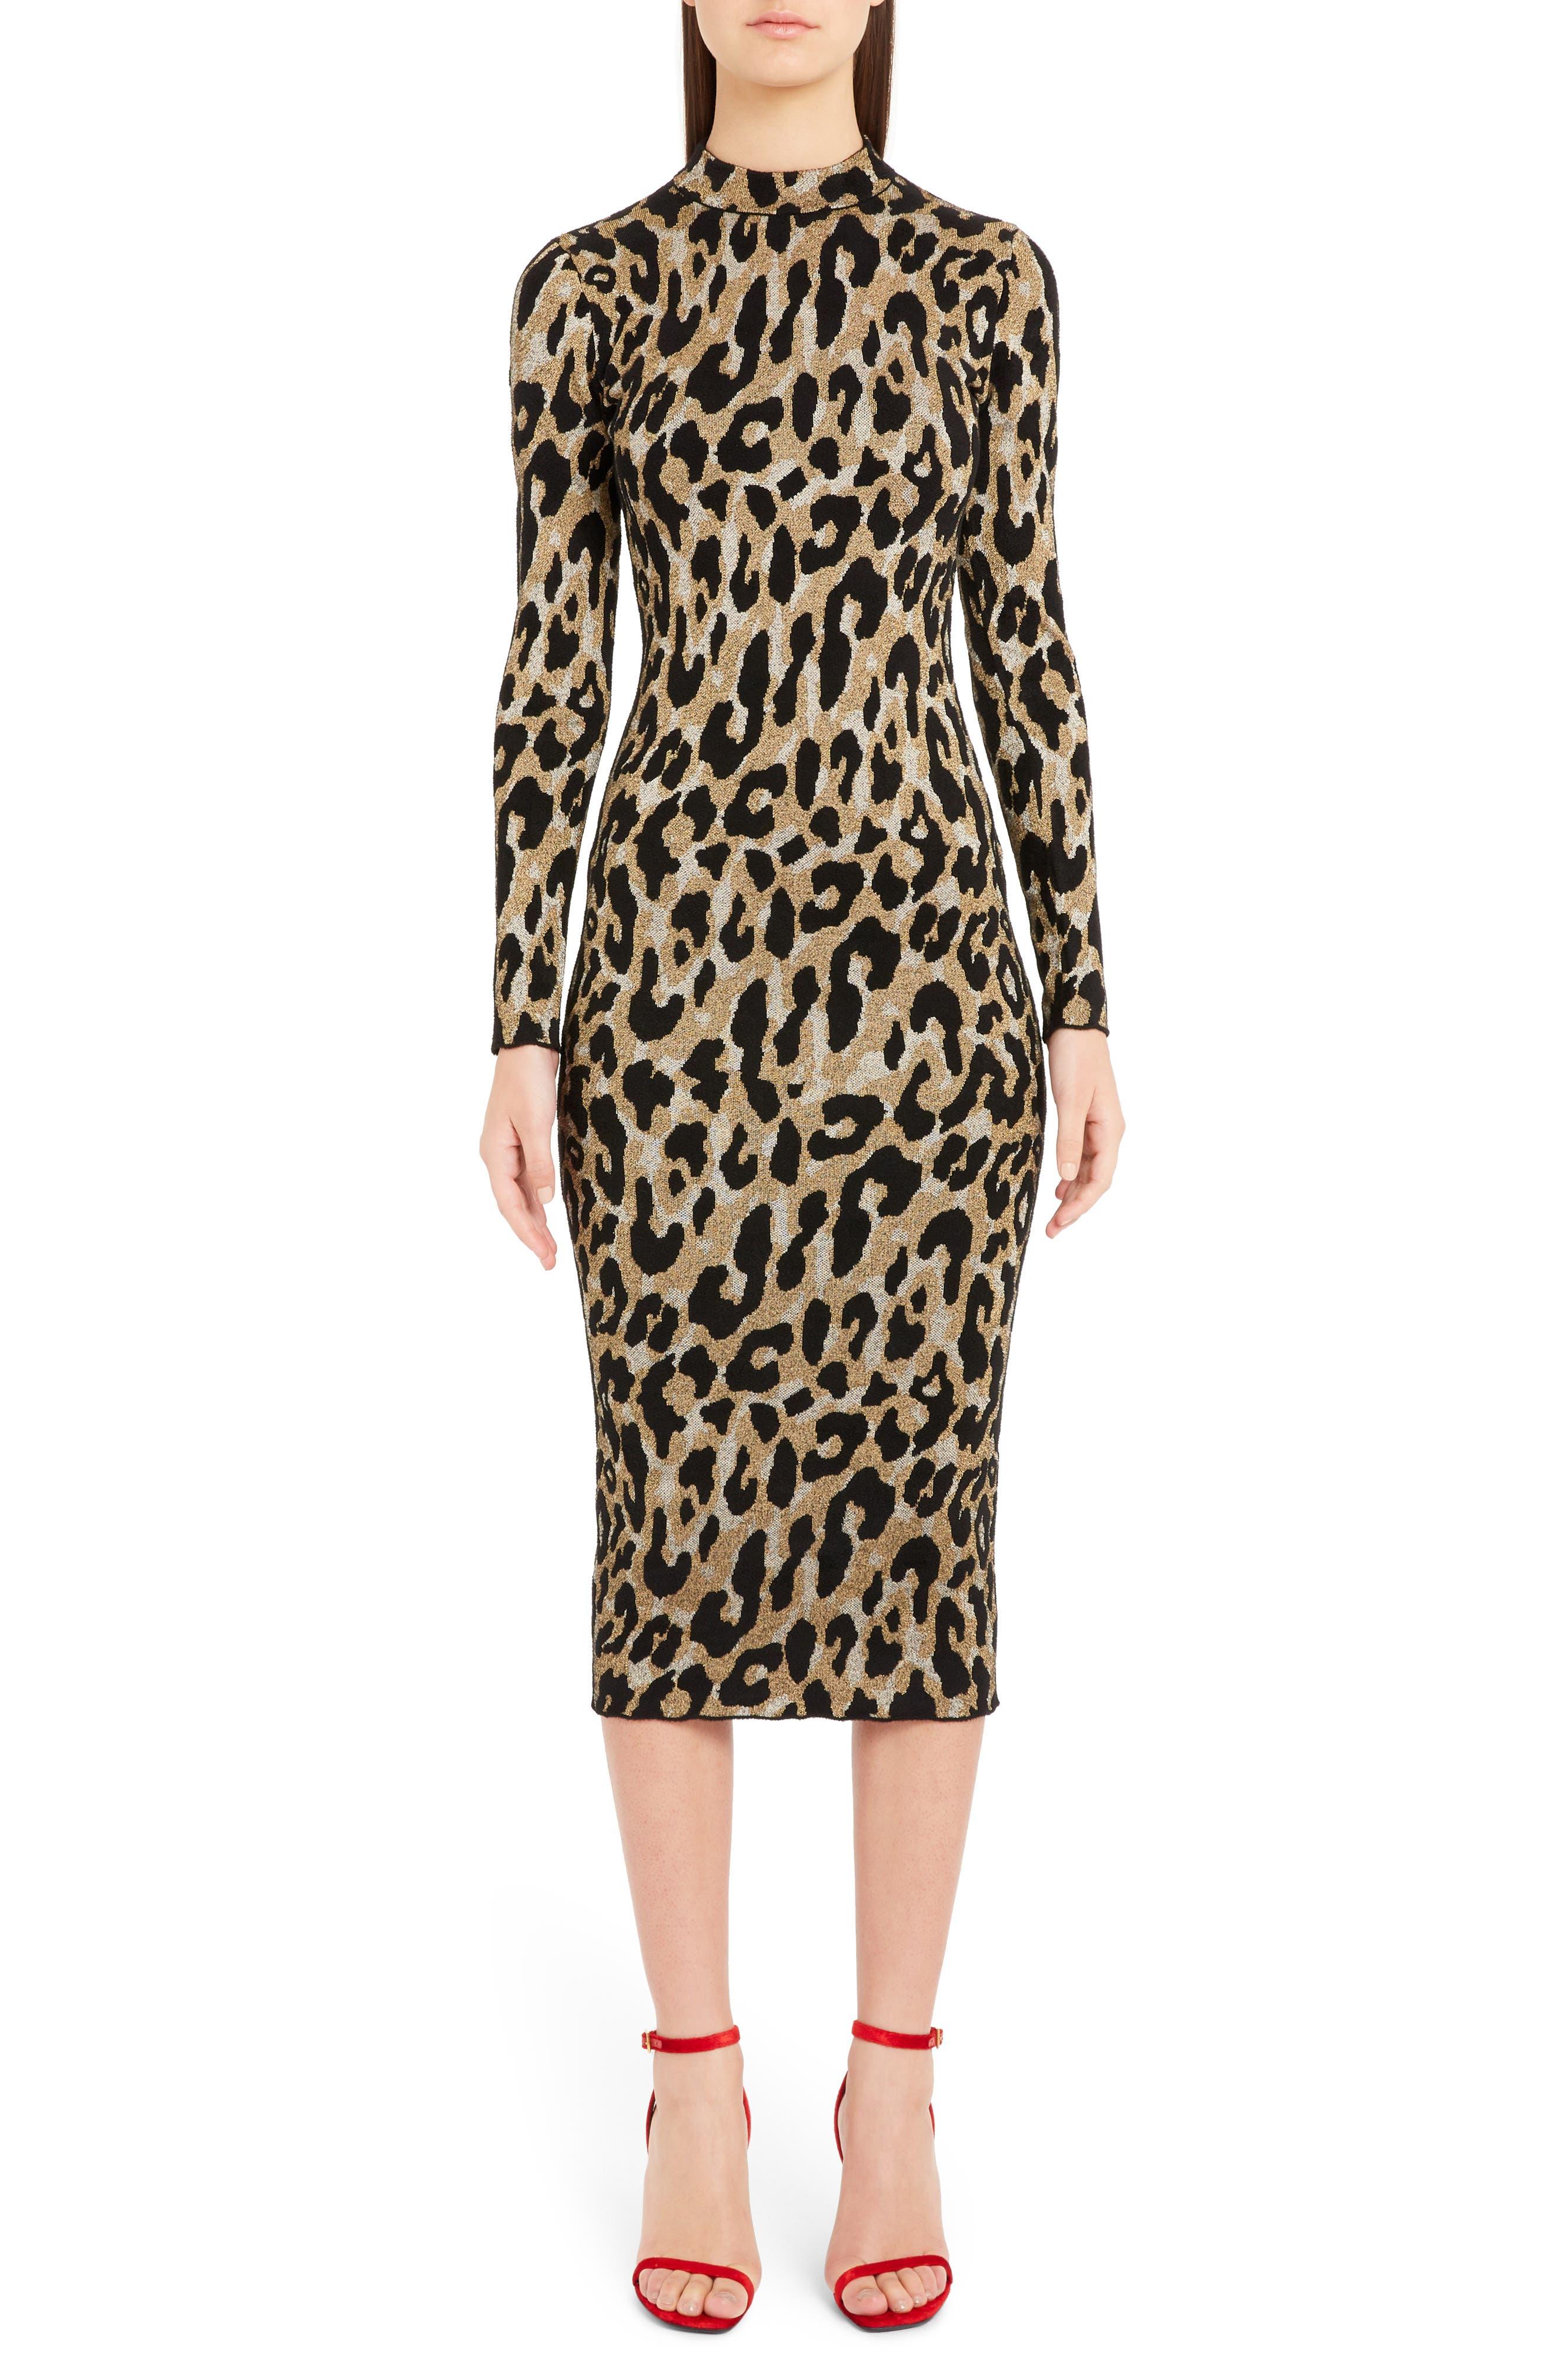 Versace Leopard Print Body-Con Dress